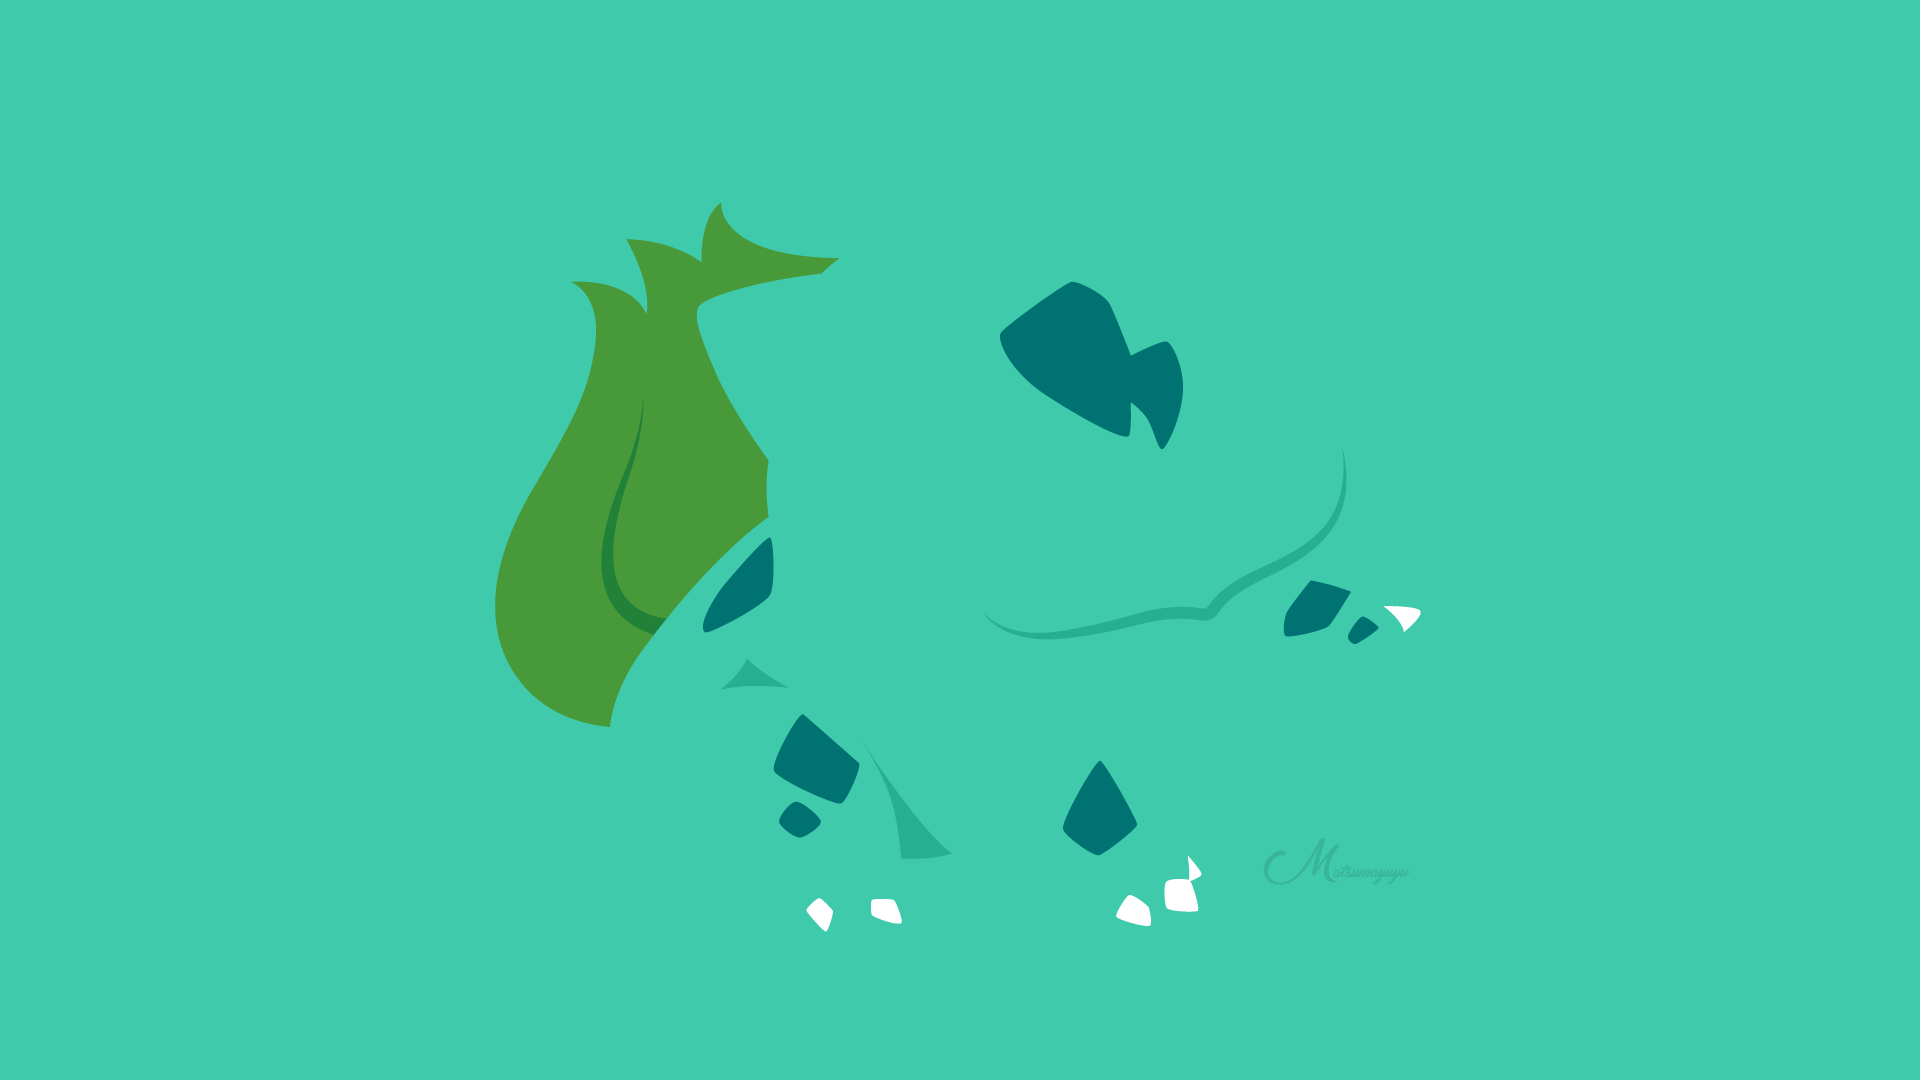 Bulbasaur From Pokemon Hd Wallpaper Background Image